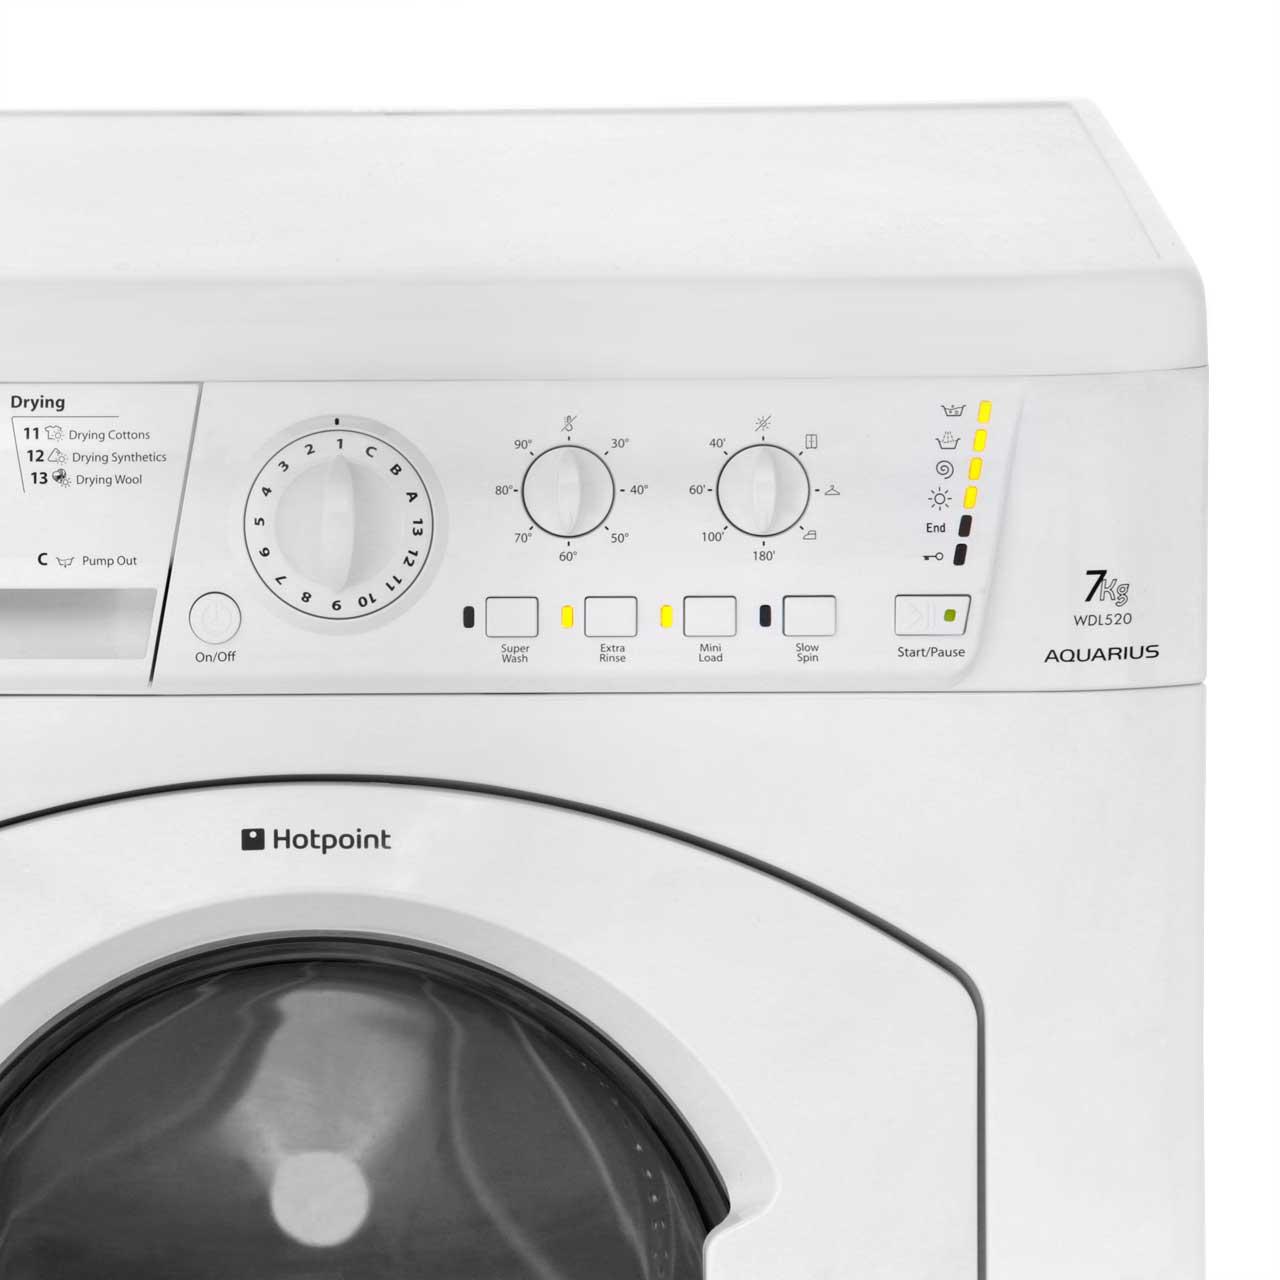 Hotpoint Aquarius Wdl520 Washer Dryer Manual 2019 Ebook